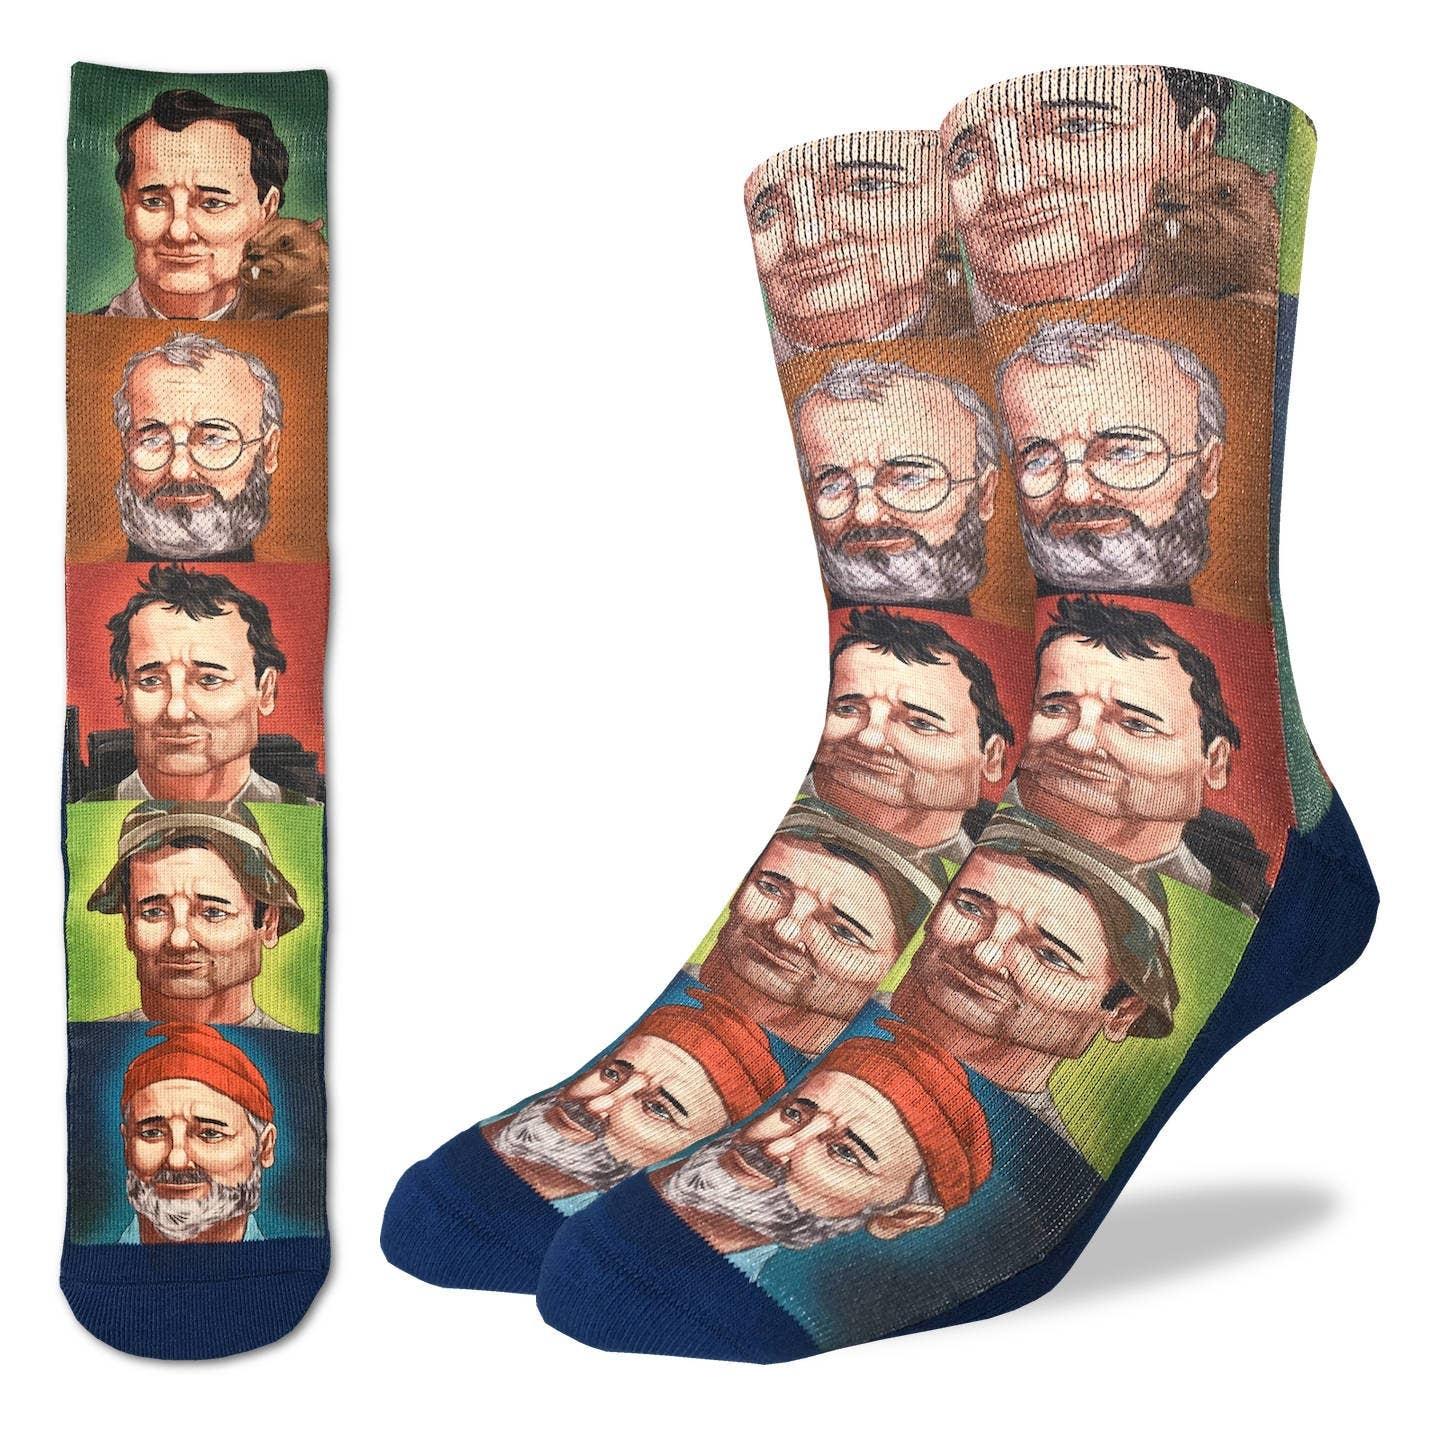 Bill Murray Men's Crew Socks